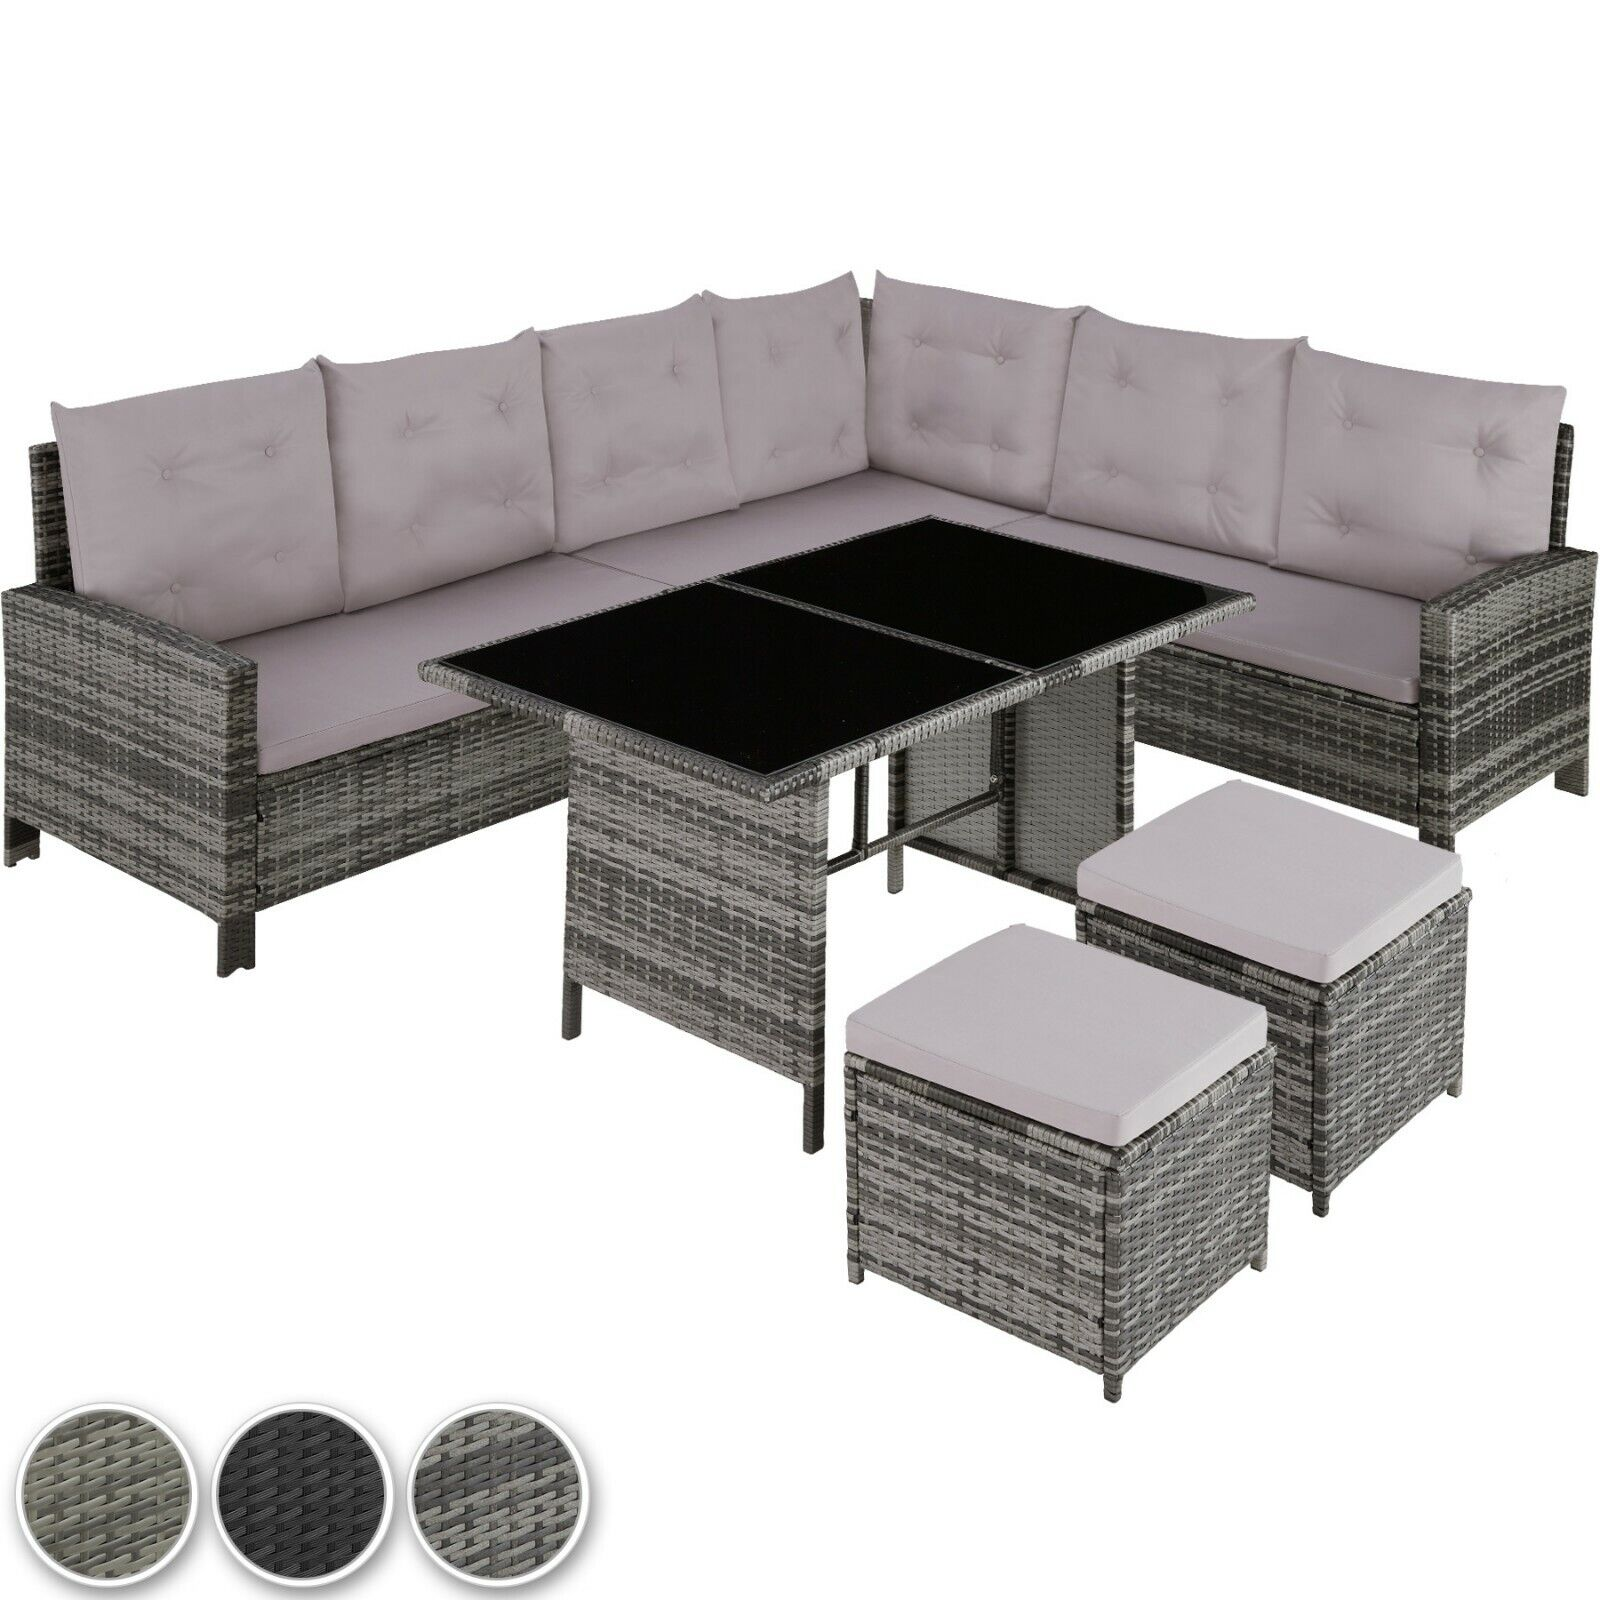 Garden Furniture - Rattan Garden Furniture Lounge Set Dining Group Corner Sofa Table Outdoor Patio